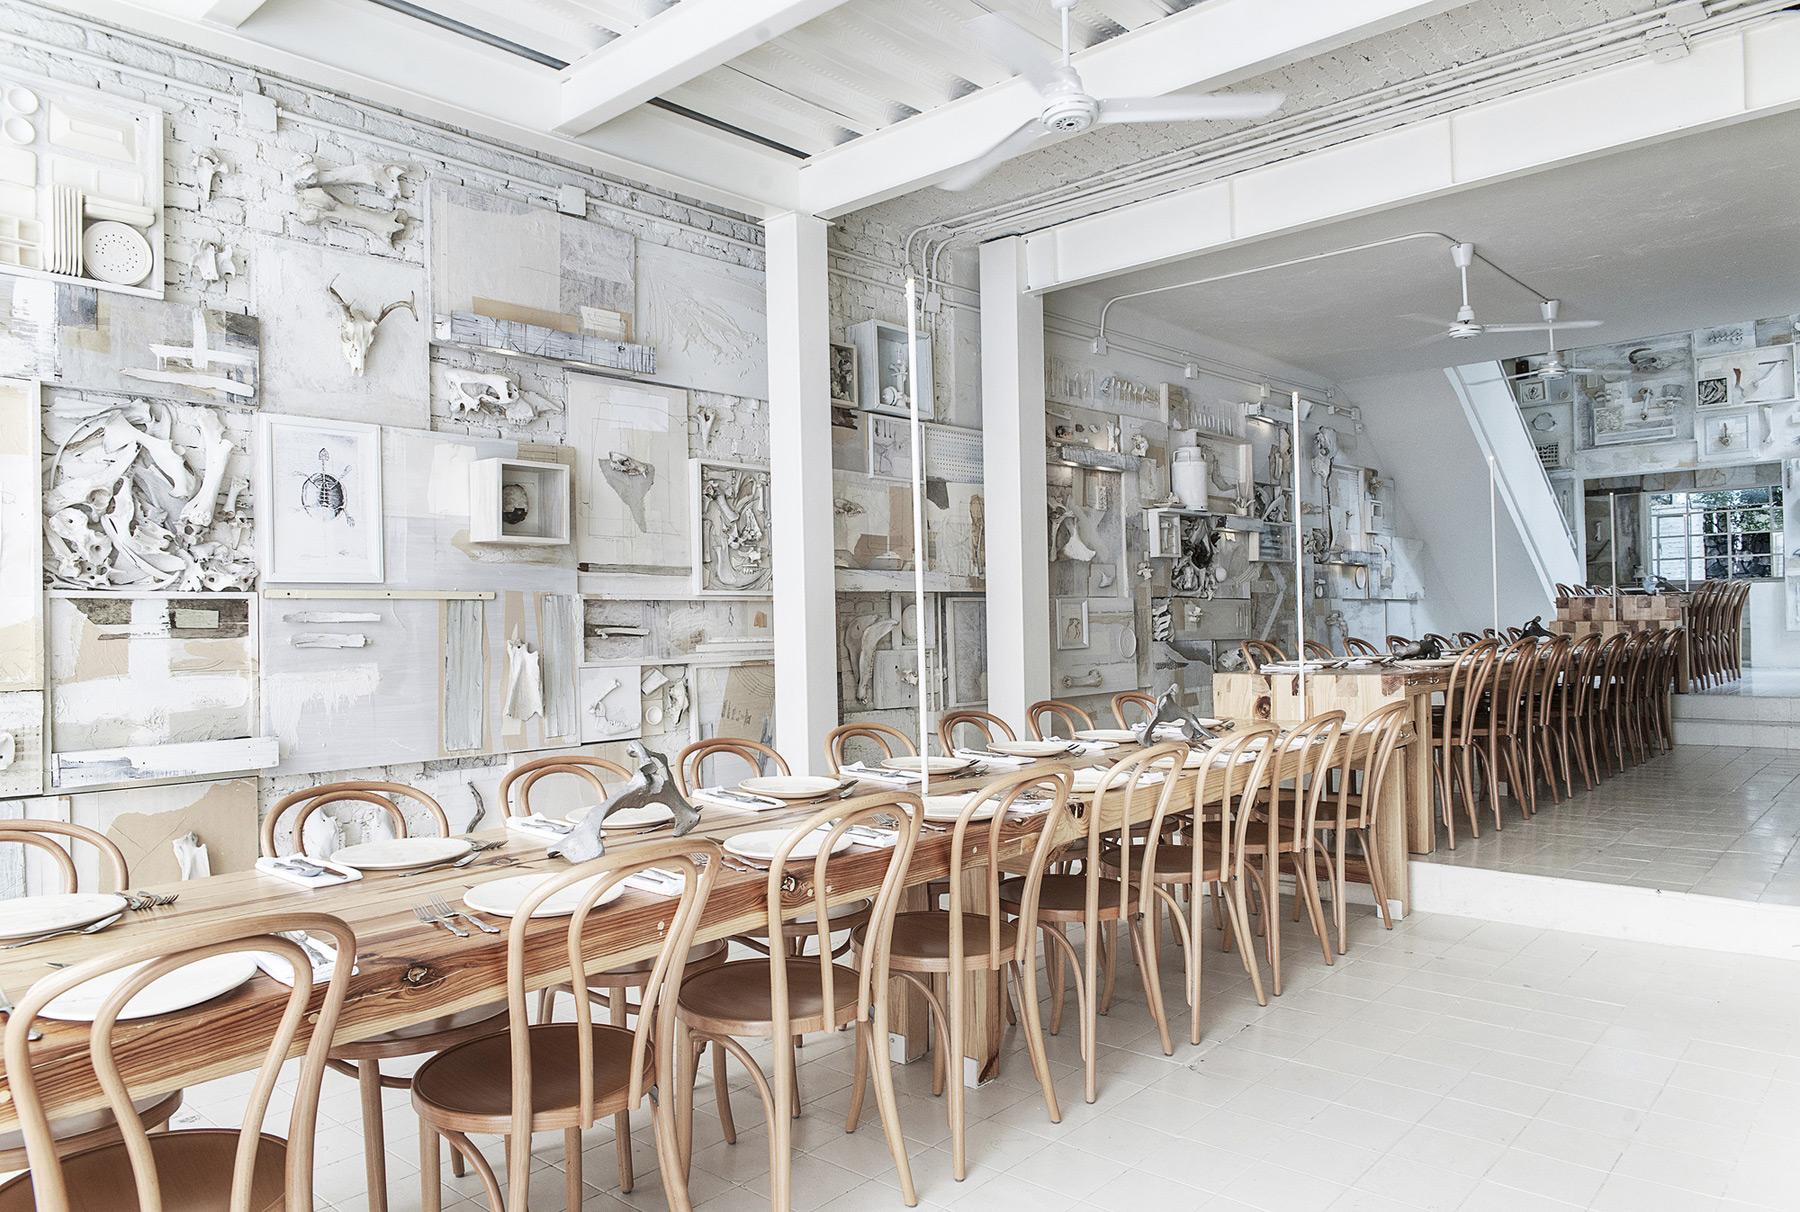 Hueso Restaurant / Cadena Asociados (31)